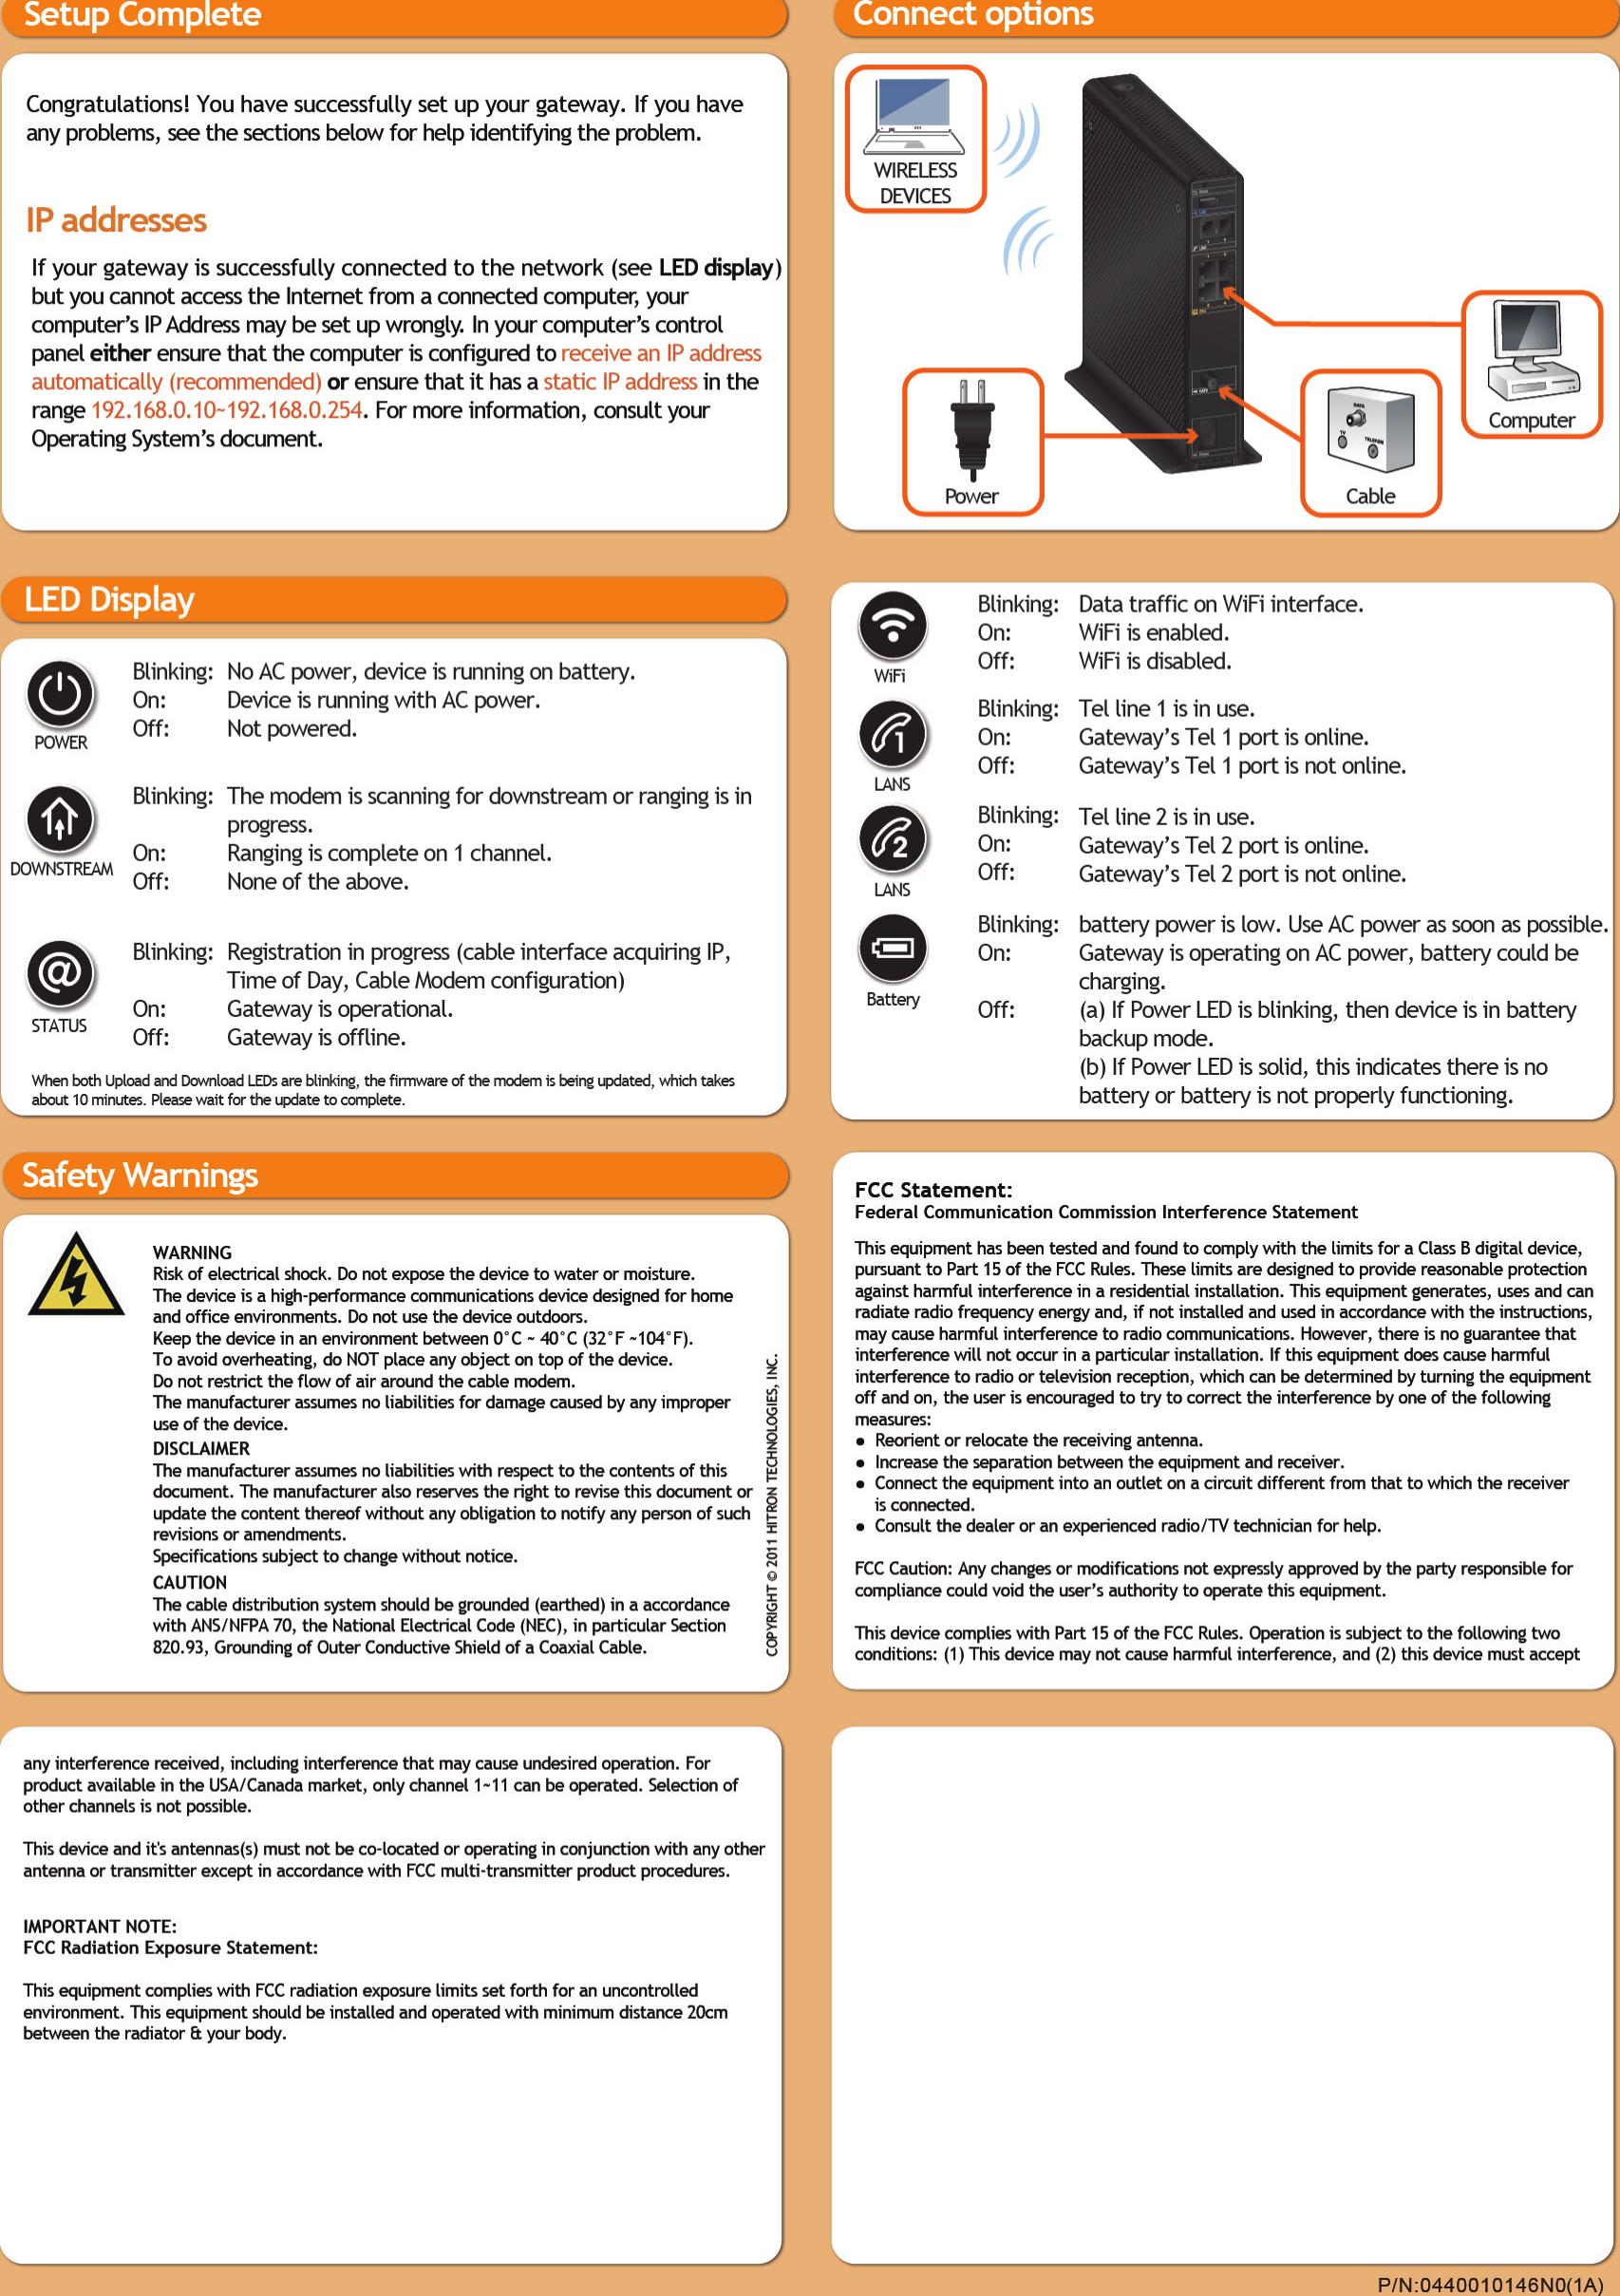 Hitron clipart tv guide clip art CGNV1A Wireless Cable Gateway User Manual Hitron TECHNOLOGIES clip art